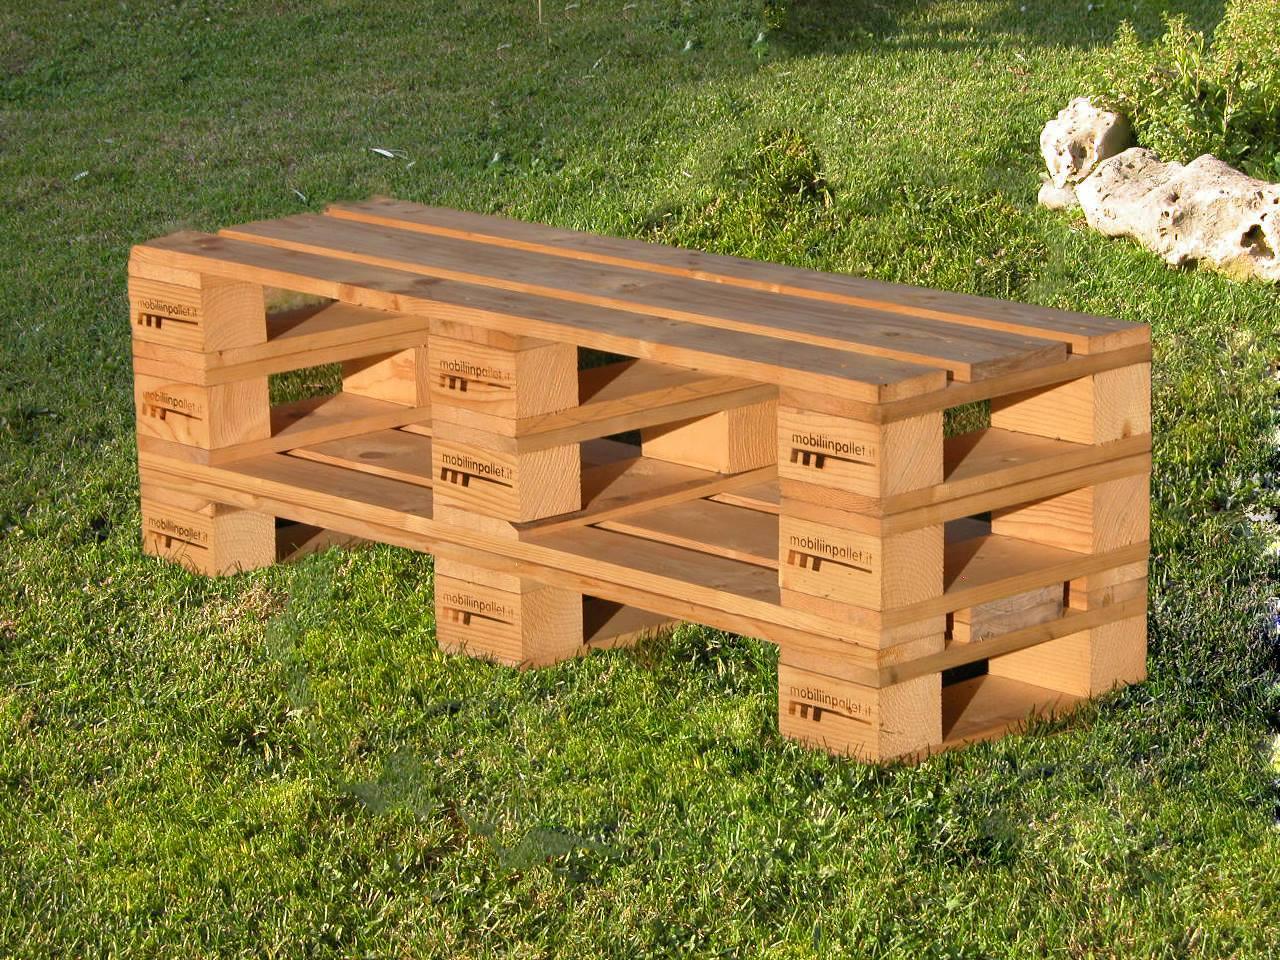 Sgabello Con Pallet : Sedie mobili in pallet